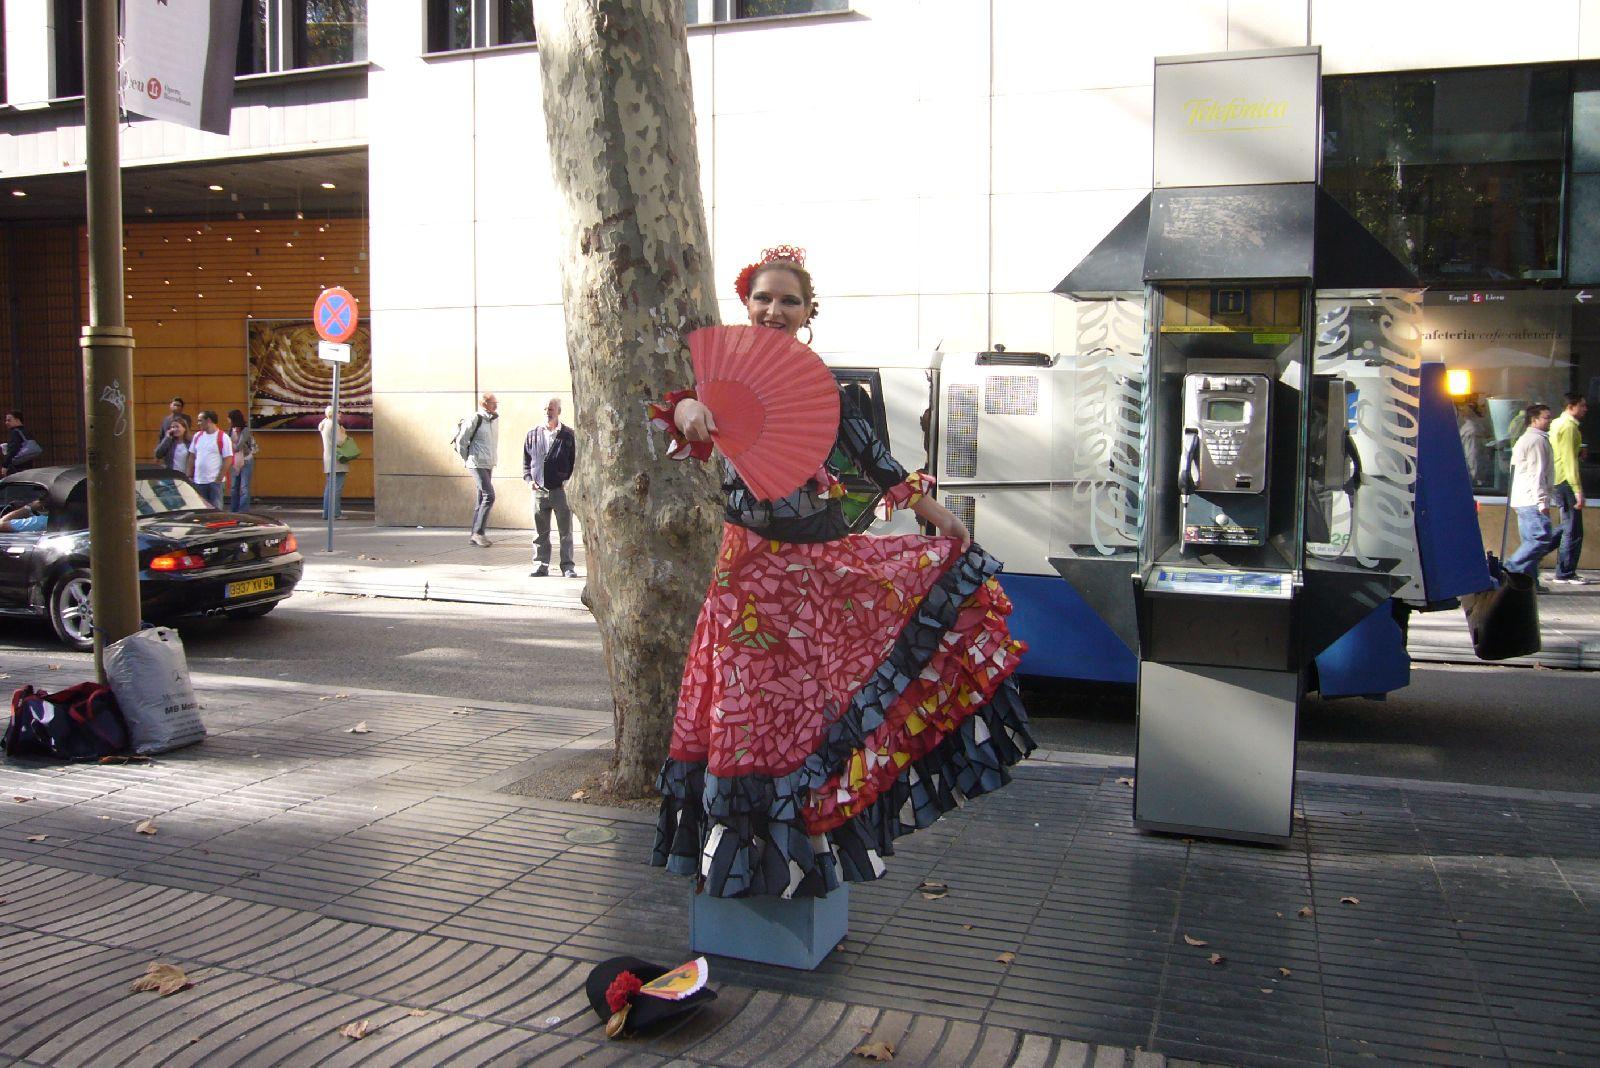 barcelona-codzienna_p1130795